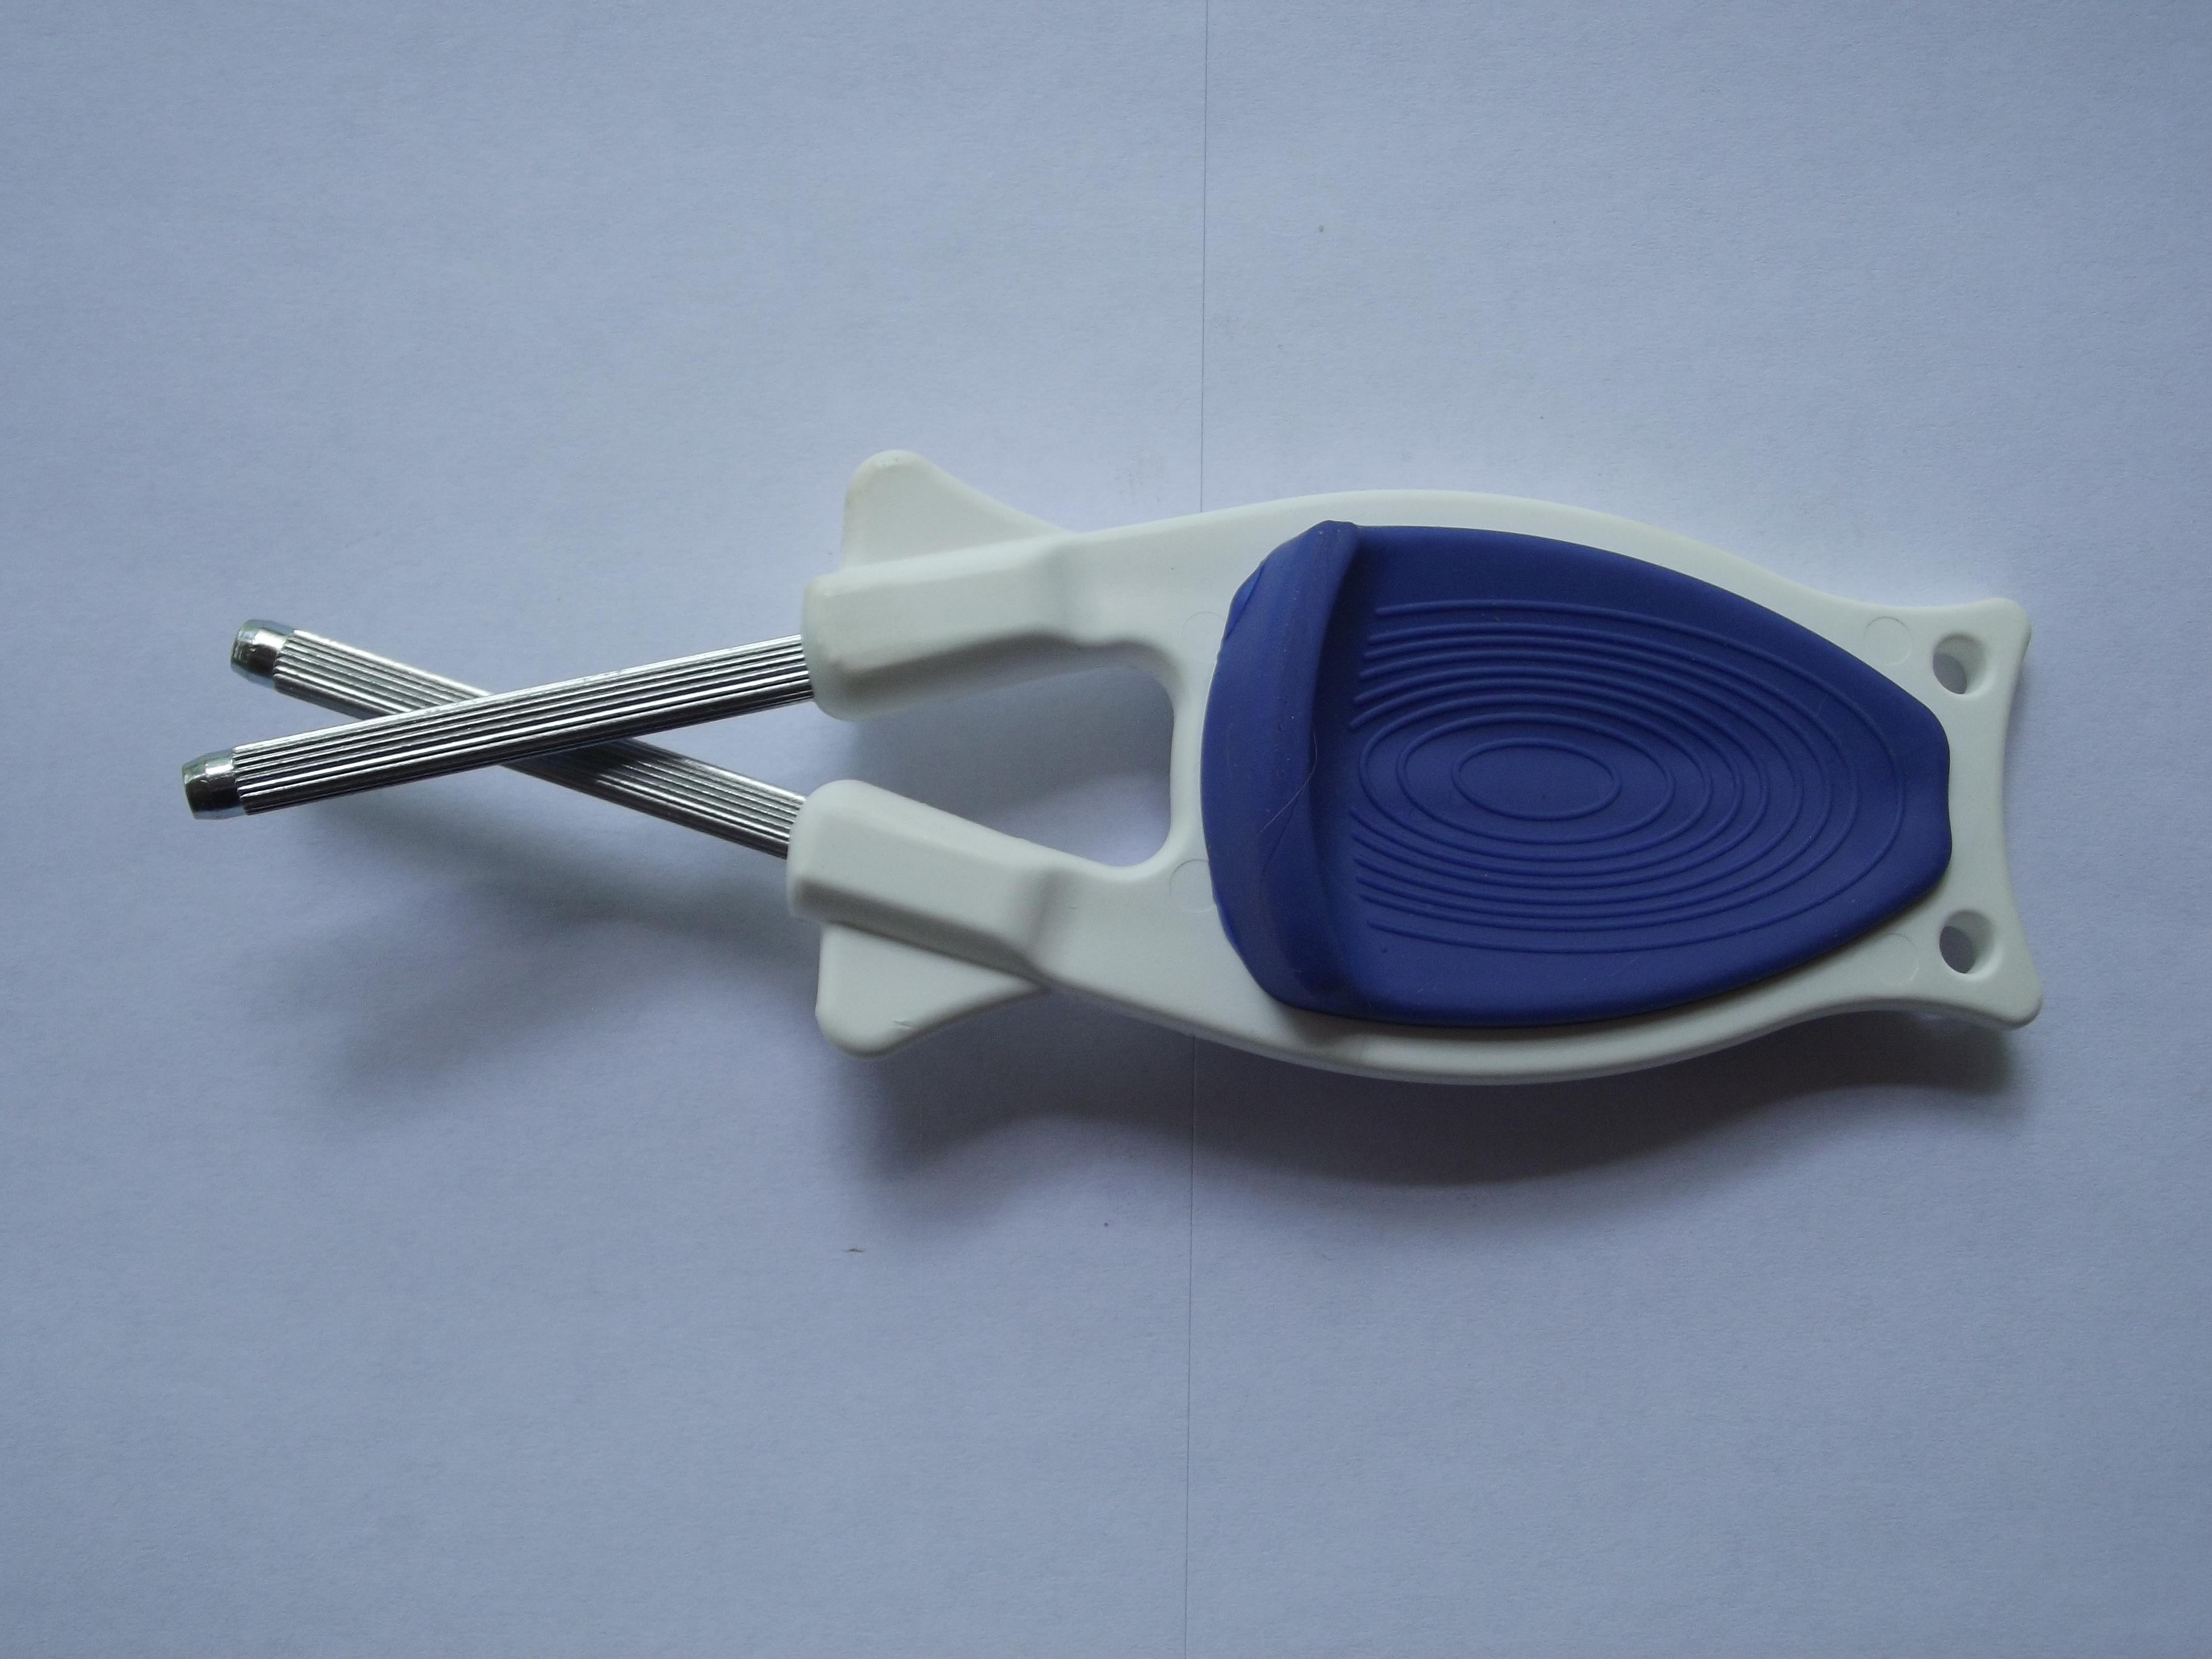 White Block sharpener with Blue Anti-Slip Grip